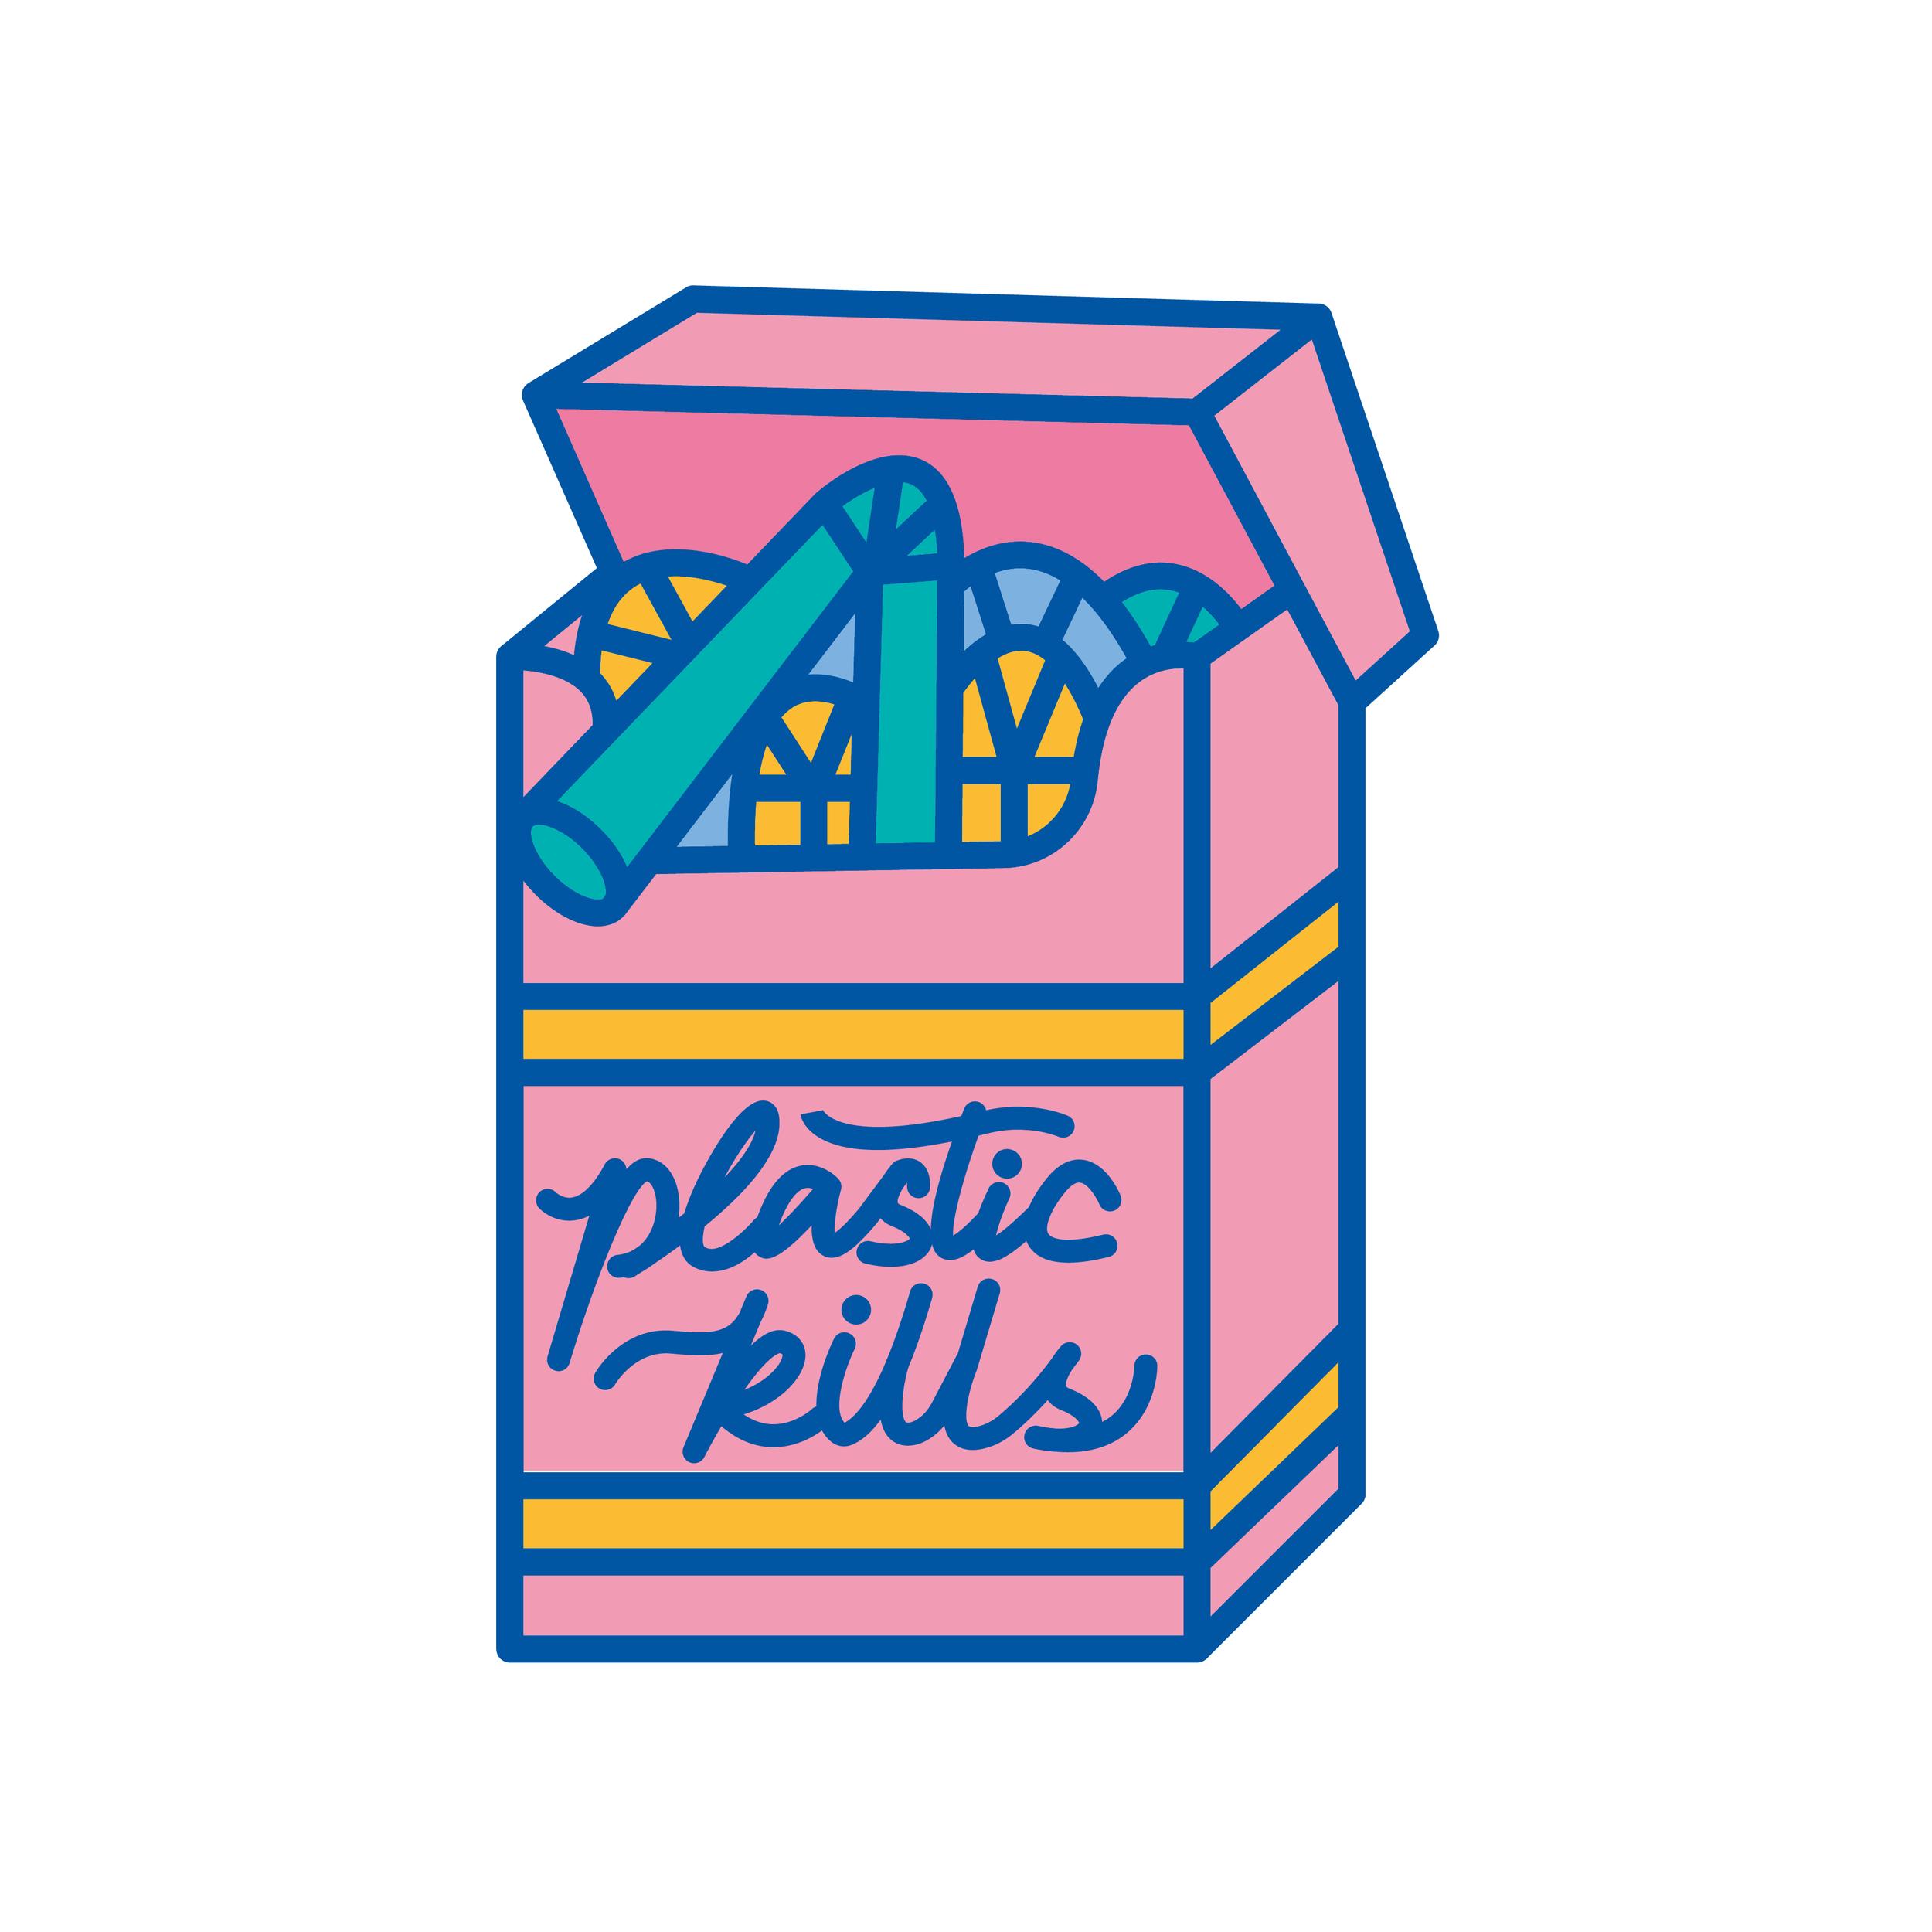 plastic-kills-fa-01.png